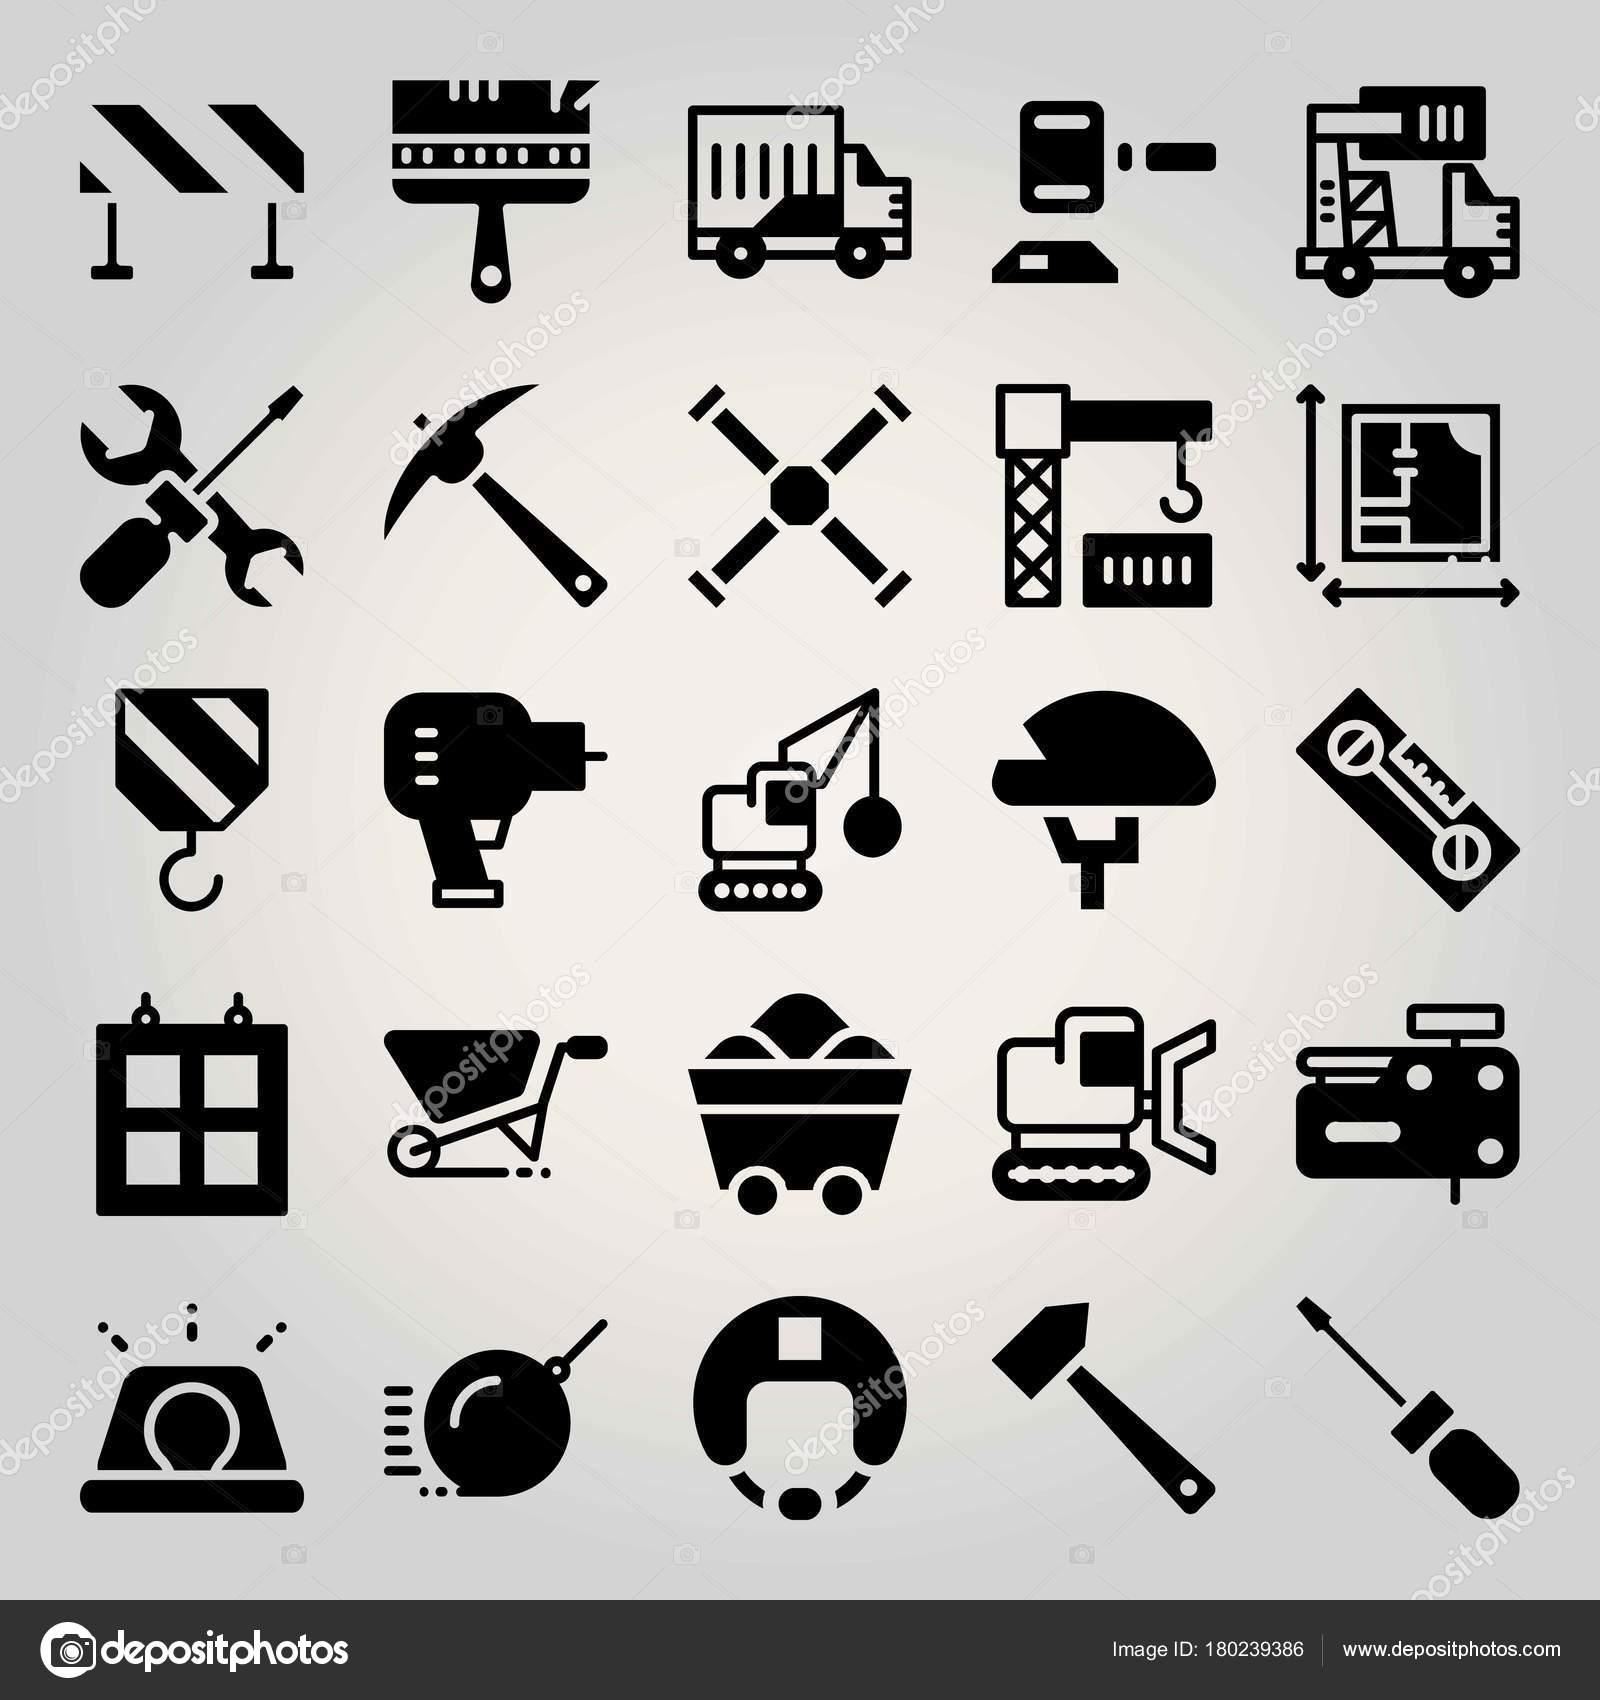 Bau-Vektor-Icon-Set. Kohle, Schubkarre, Hammer und Abbruch ...